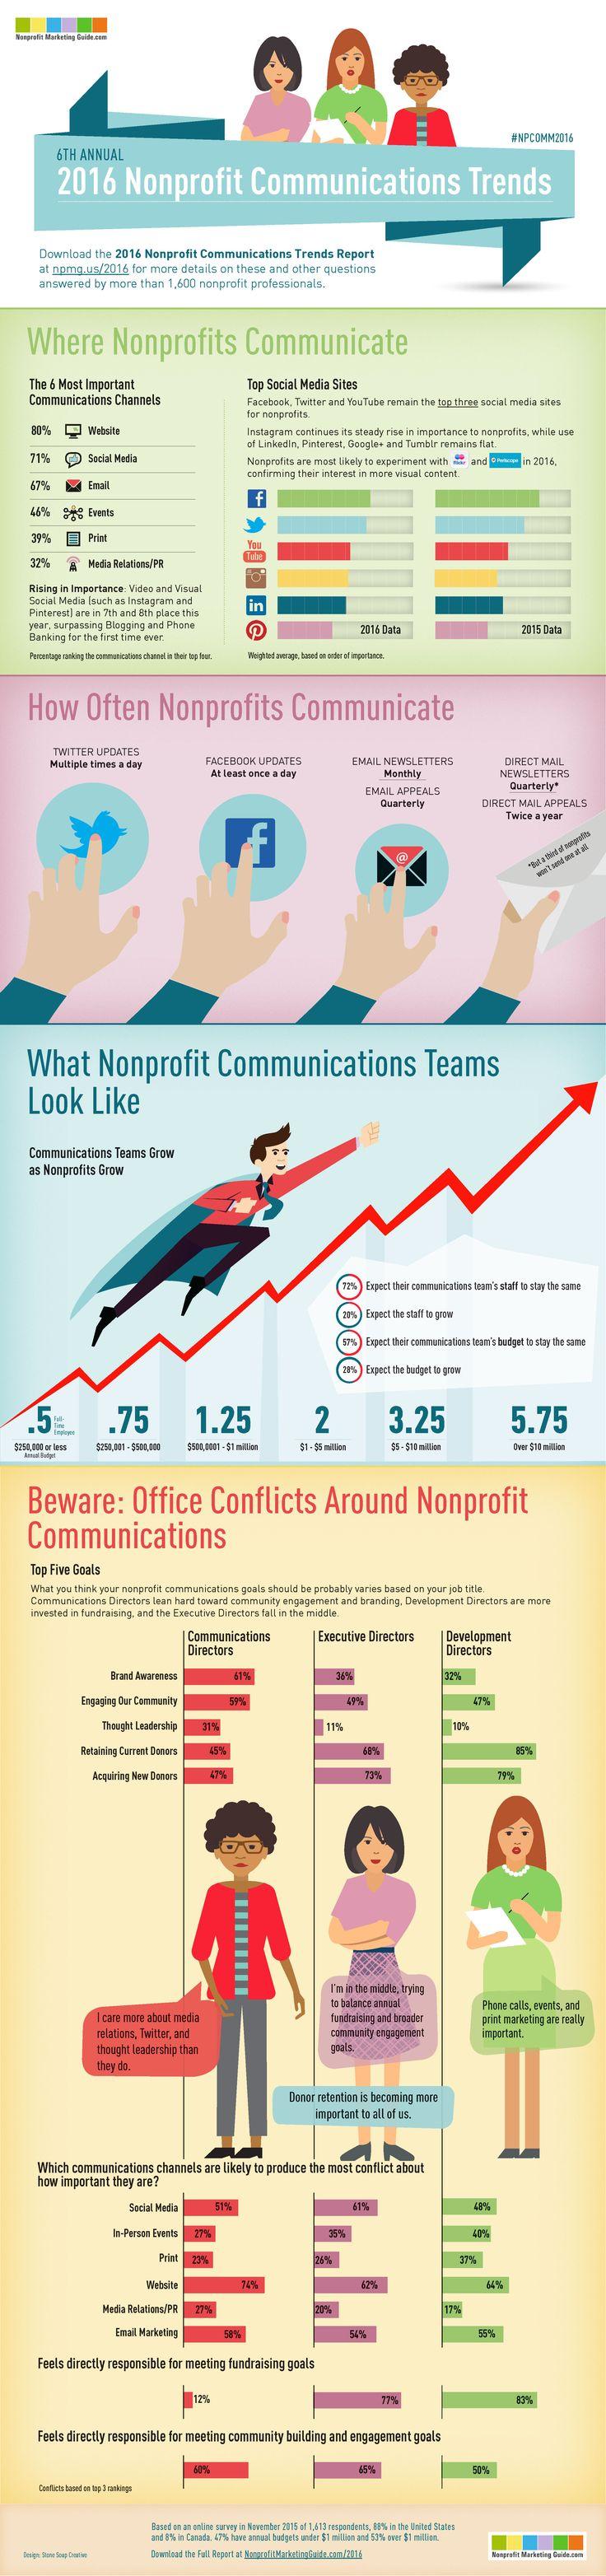 Infographic: 2016 Nonprofit Communications Trends